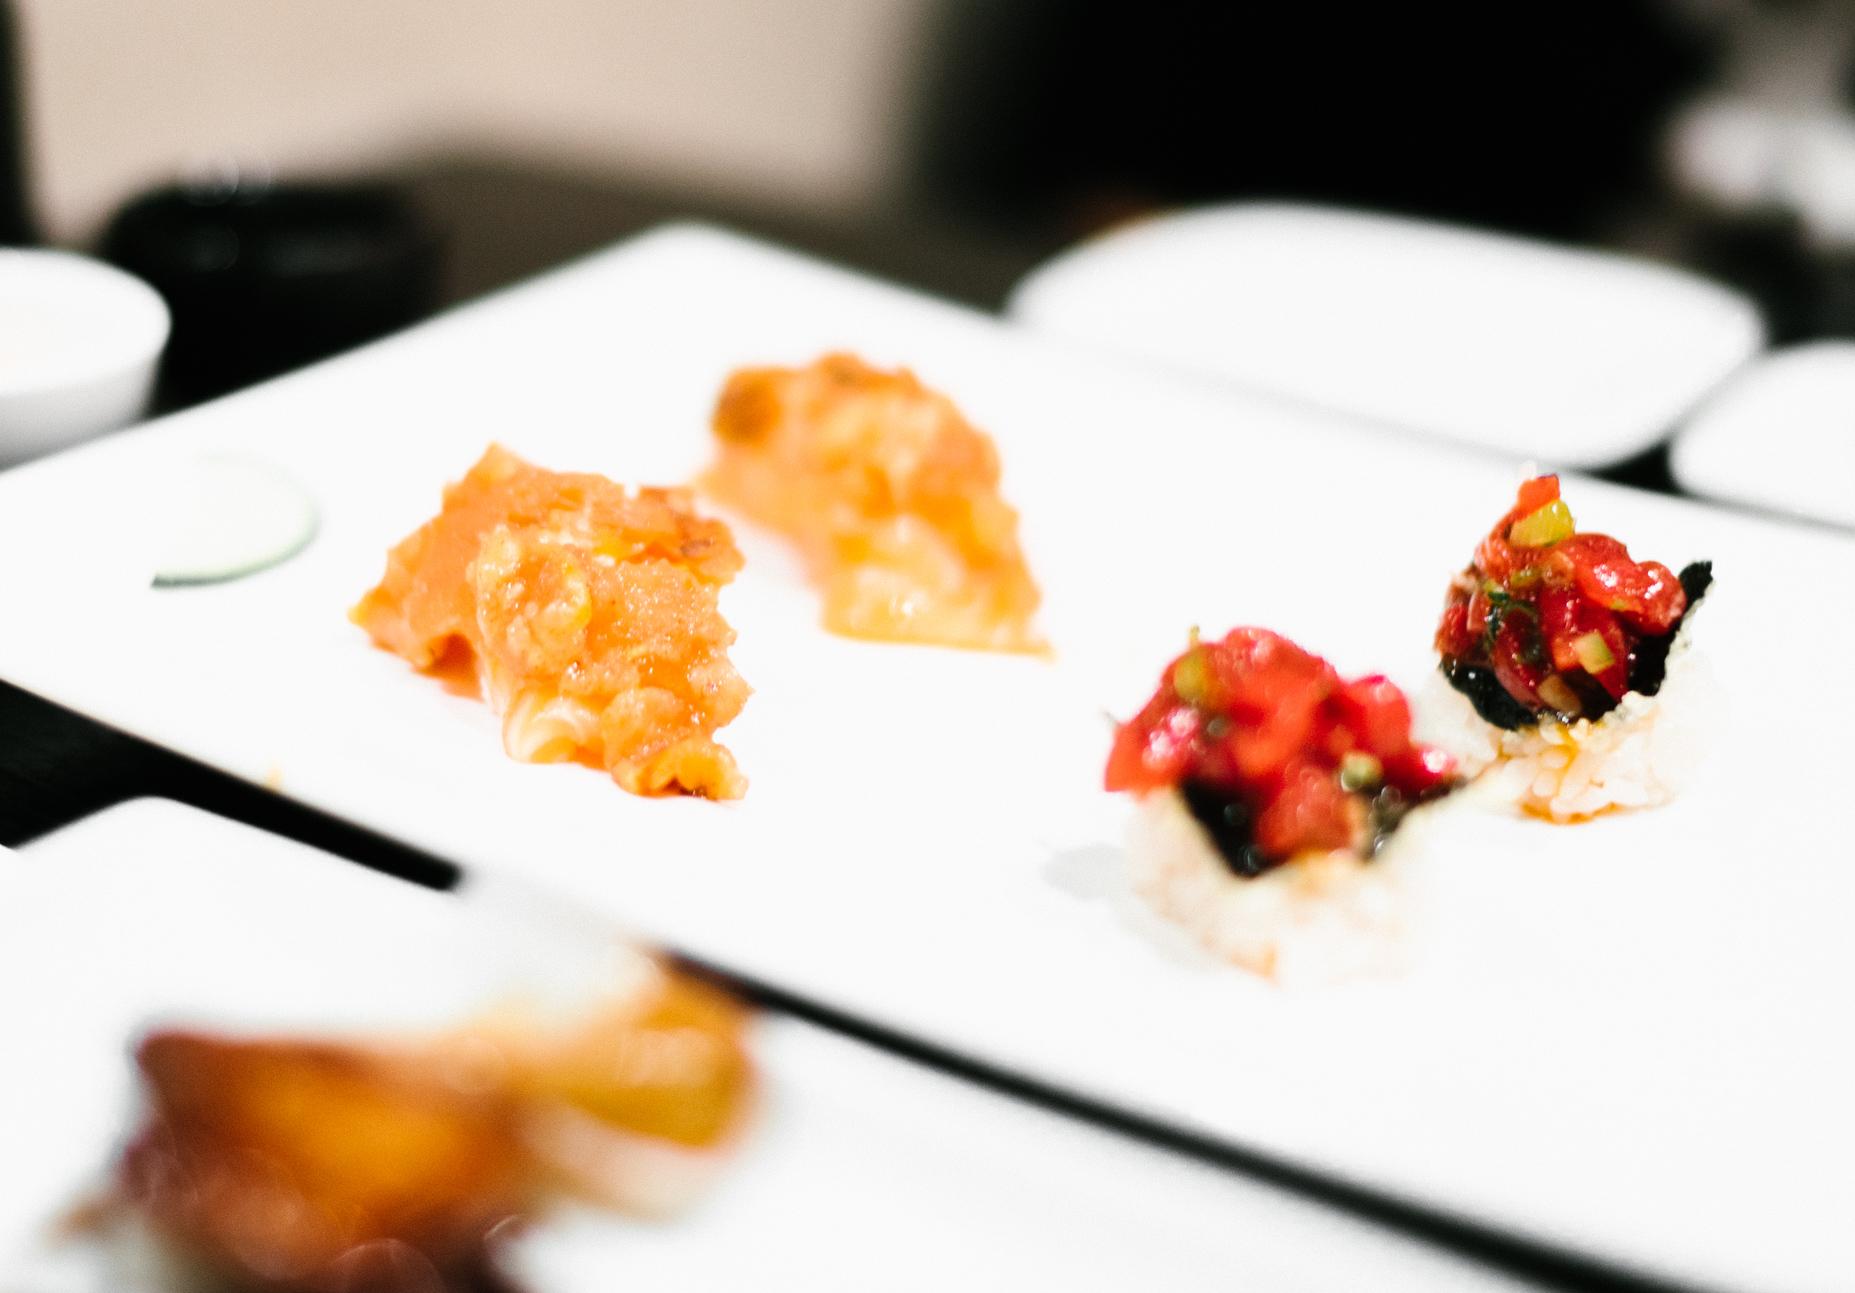 Salmon Sautéed Tomato / Korean Sweet Sauce Marinated Tuna  with roasted pine nuts and nori seaweed